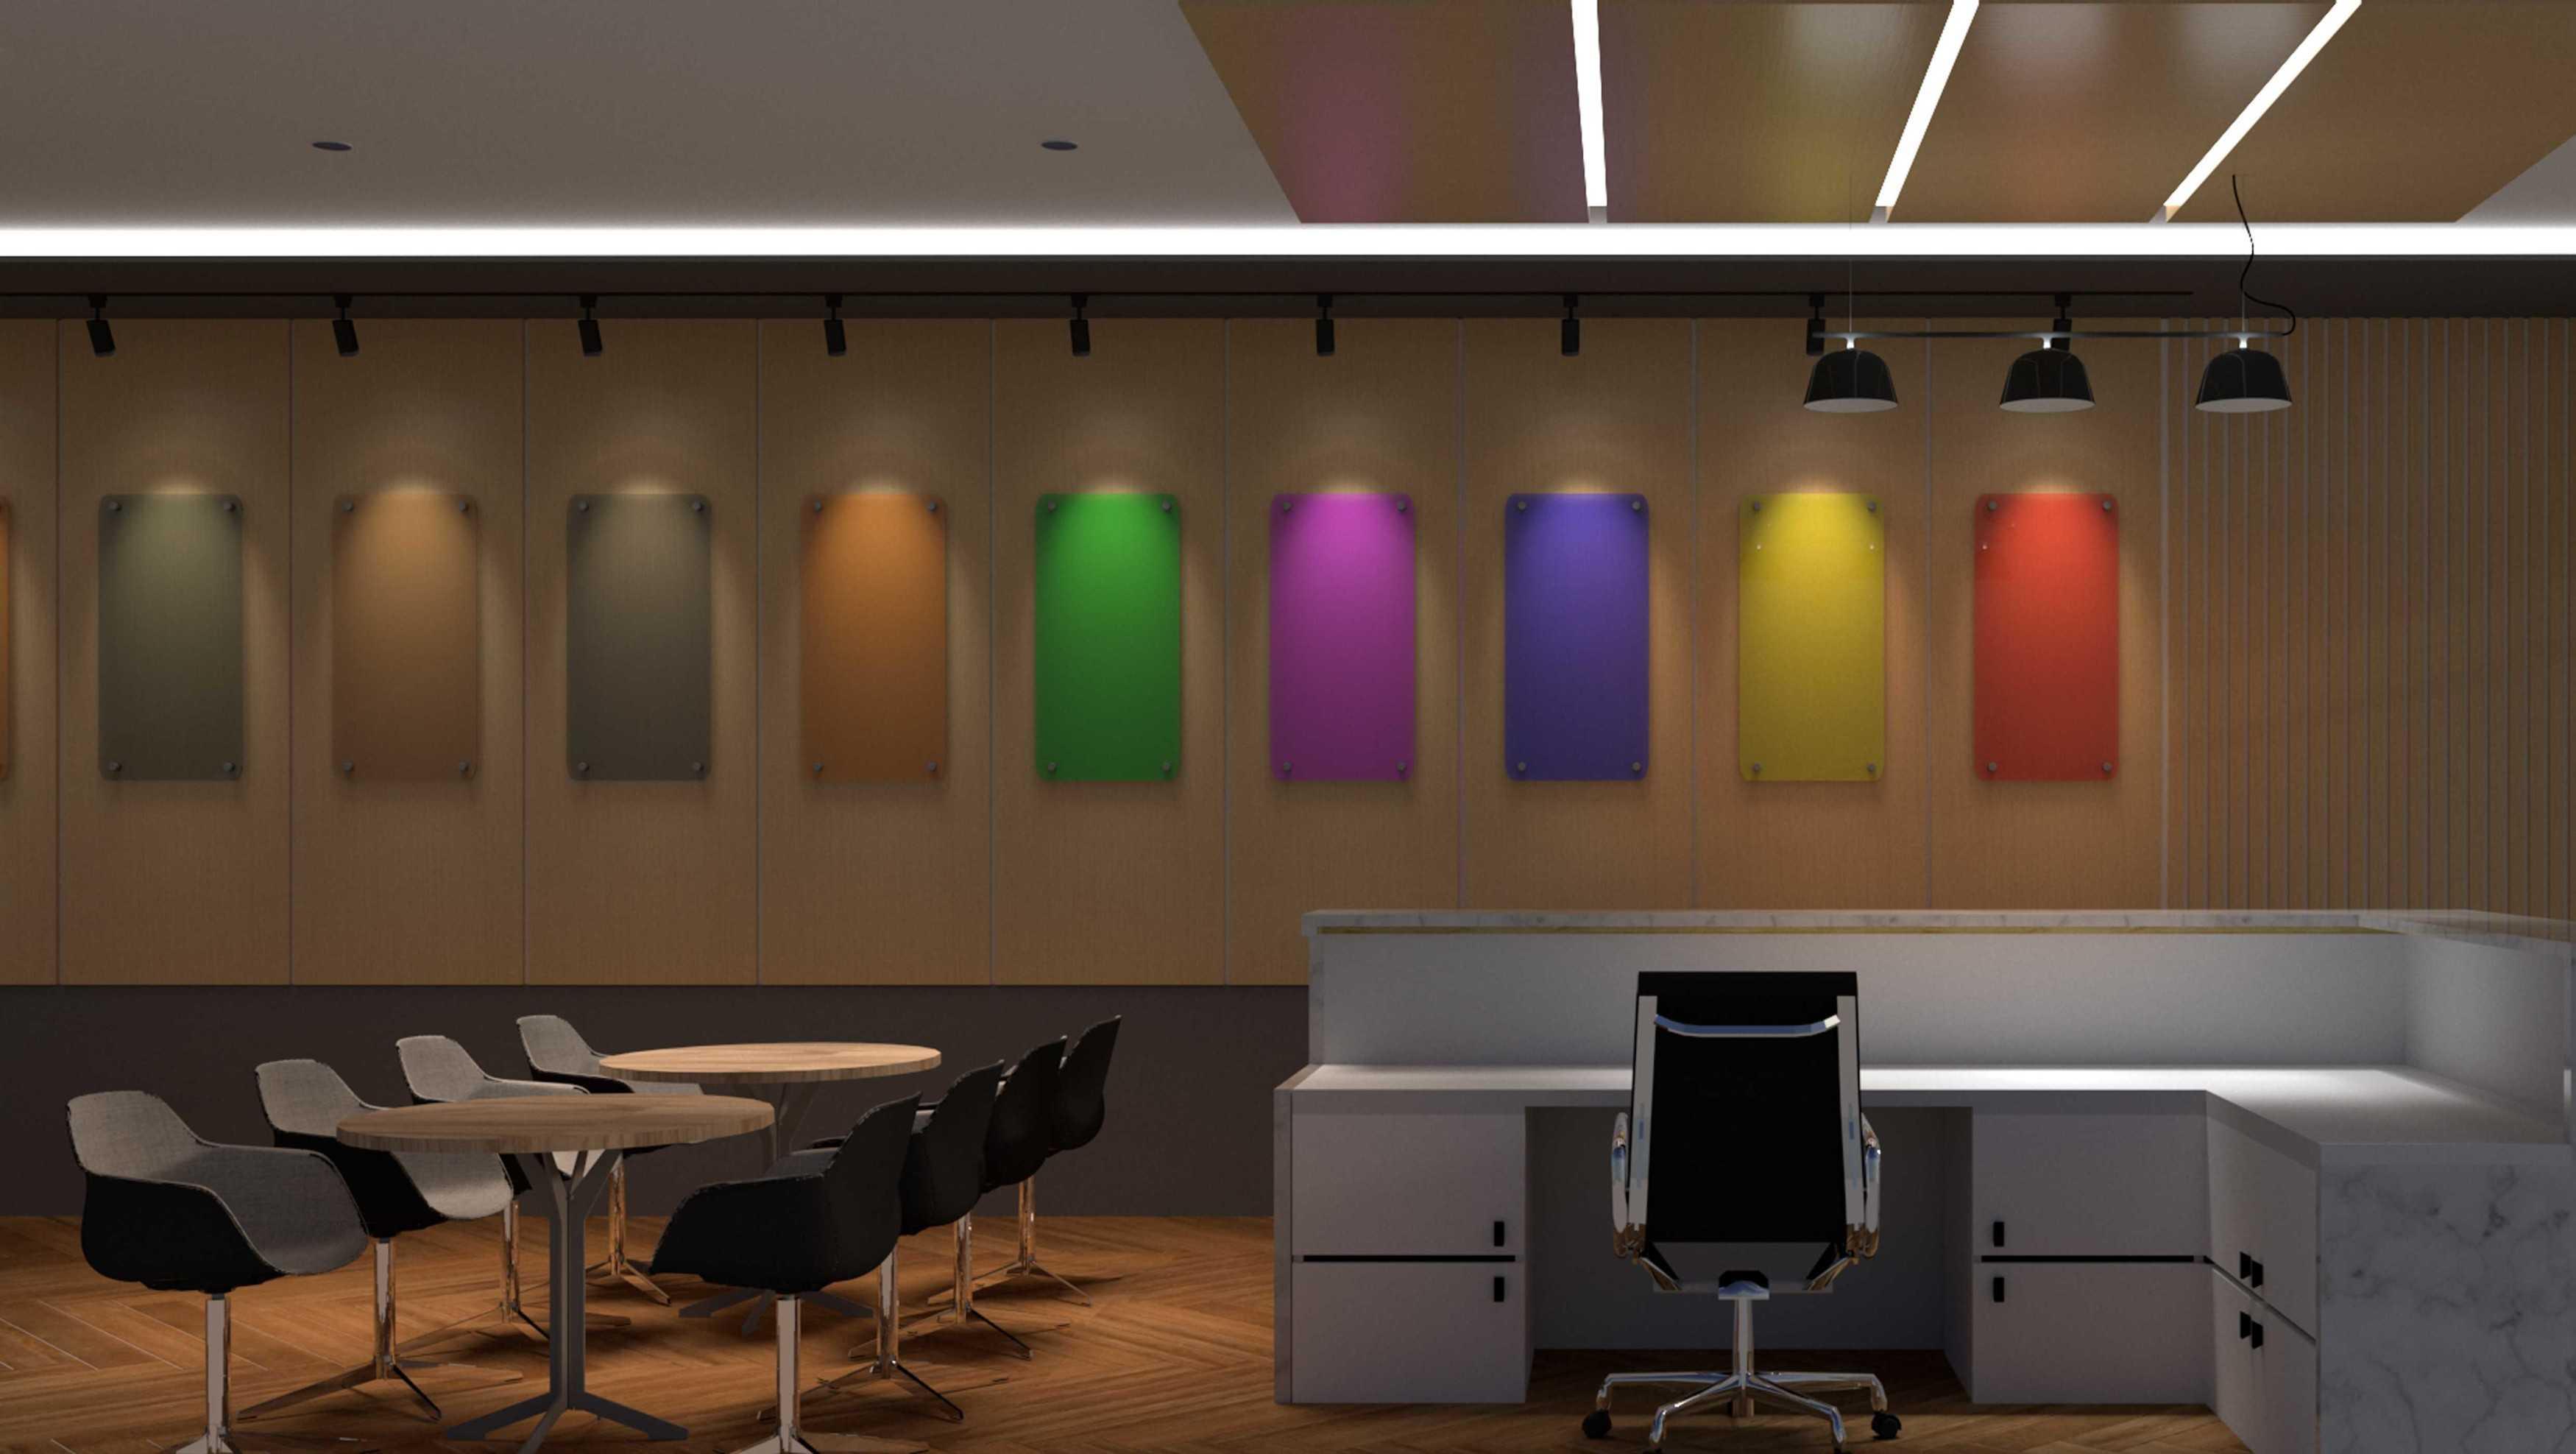 Yrs Design Interior Acrylic Store Kota Tgr. Sel., Kota Tangerang Selatan, Banten, Indonesia Kota Tgr. Sel., Kota Tangerang Selatan, Banten, Indonesia Yrs-Design-Interior-Acrylic-Store   112765